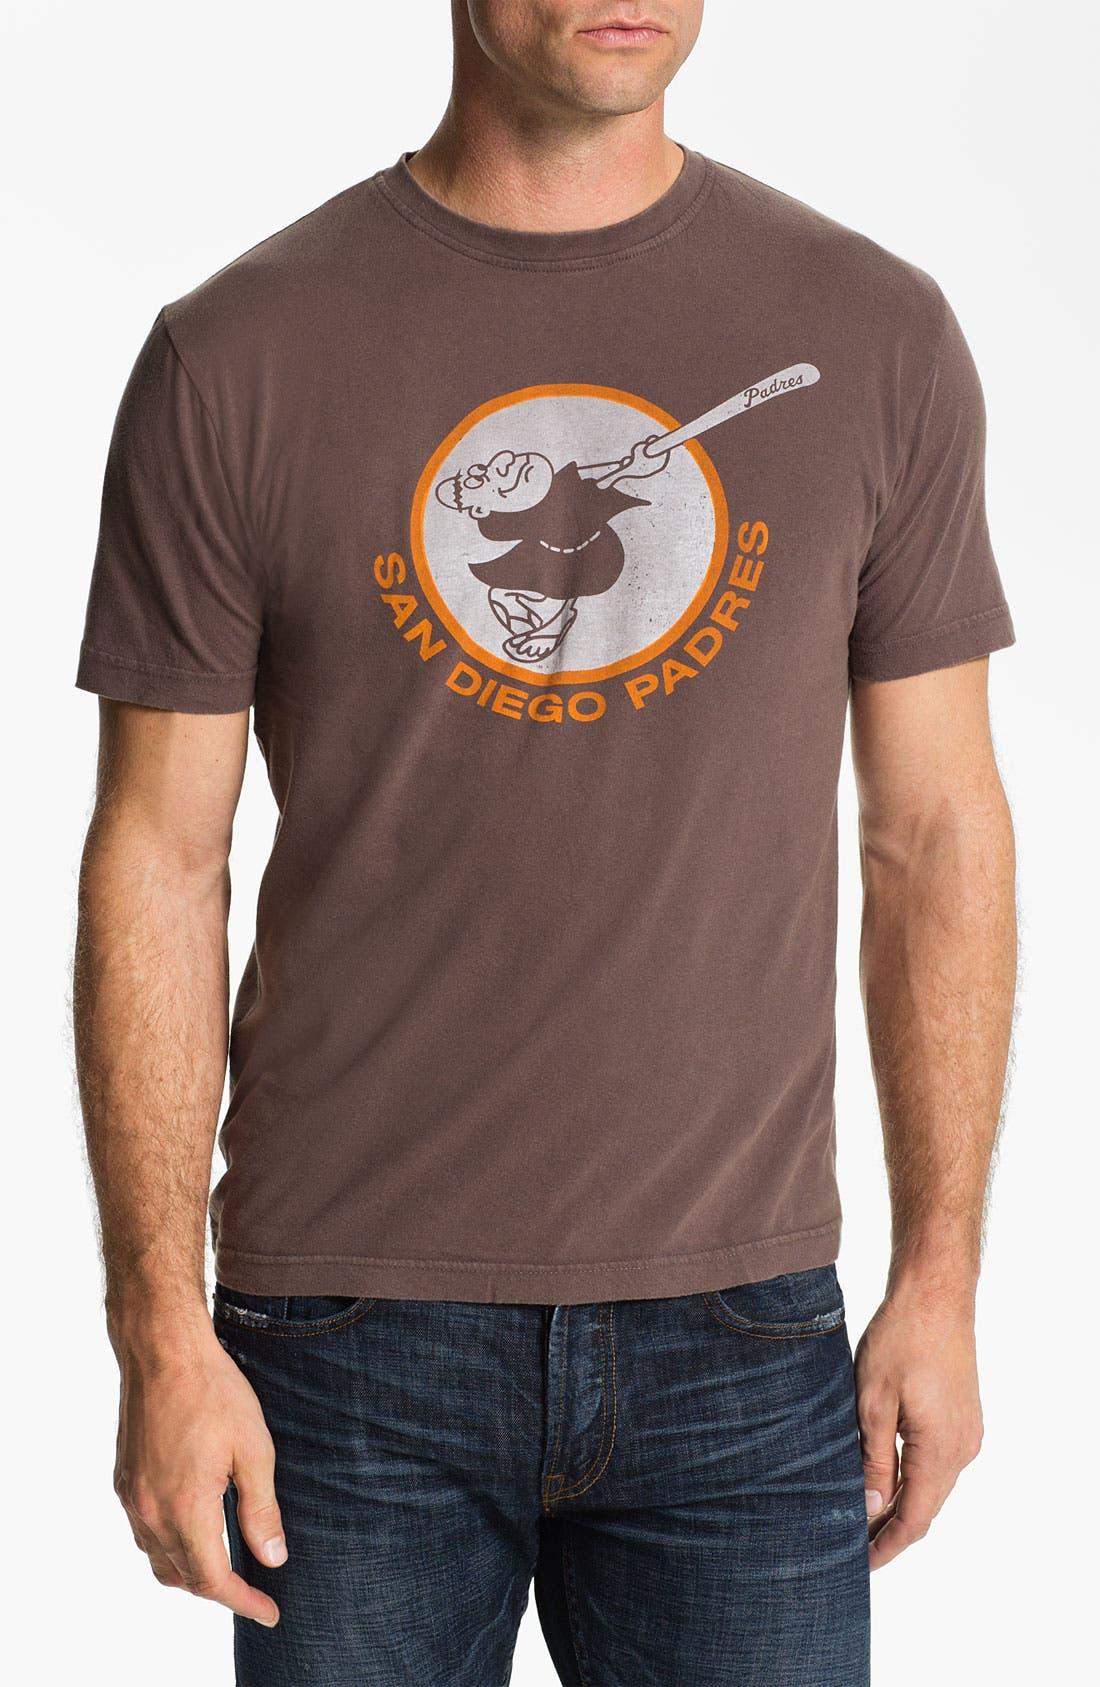 Red Jacket 'San Diego Padres' Trim Fit T-Shirt (Men)